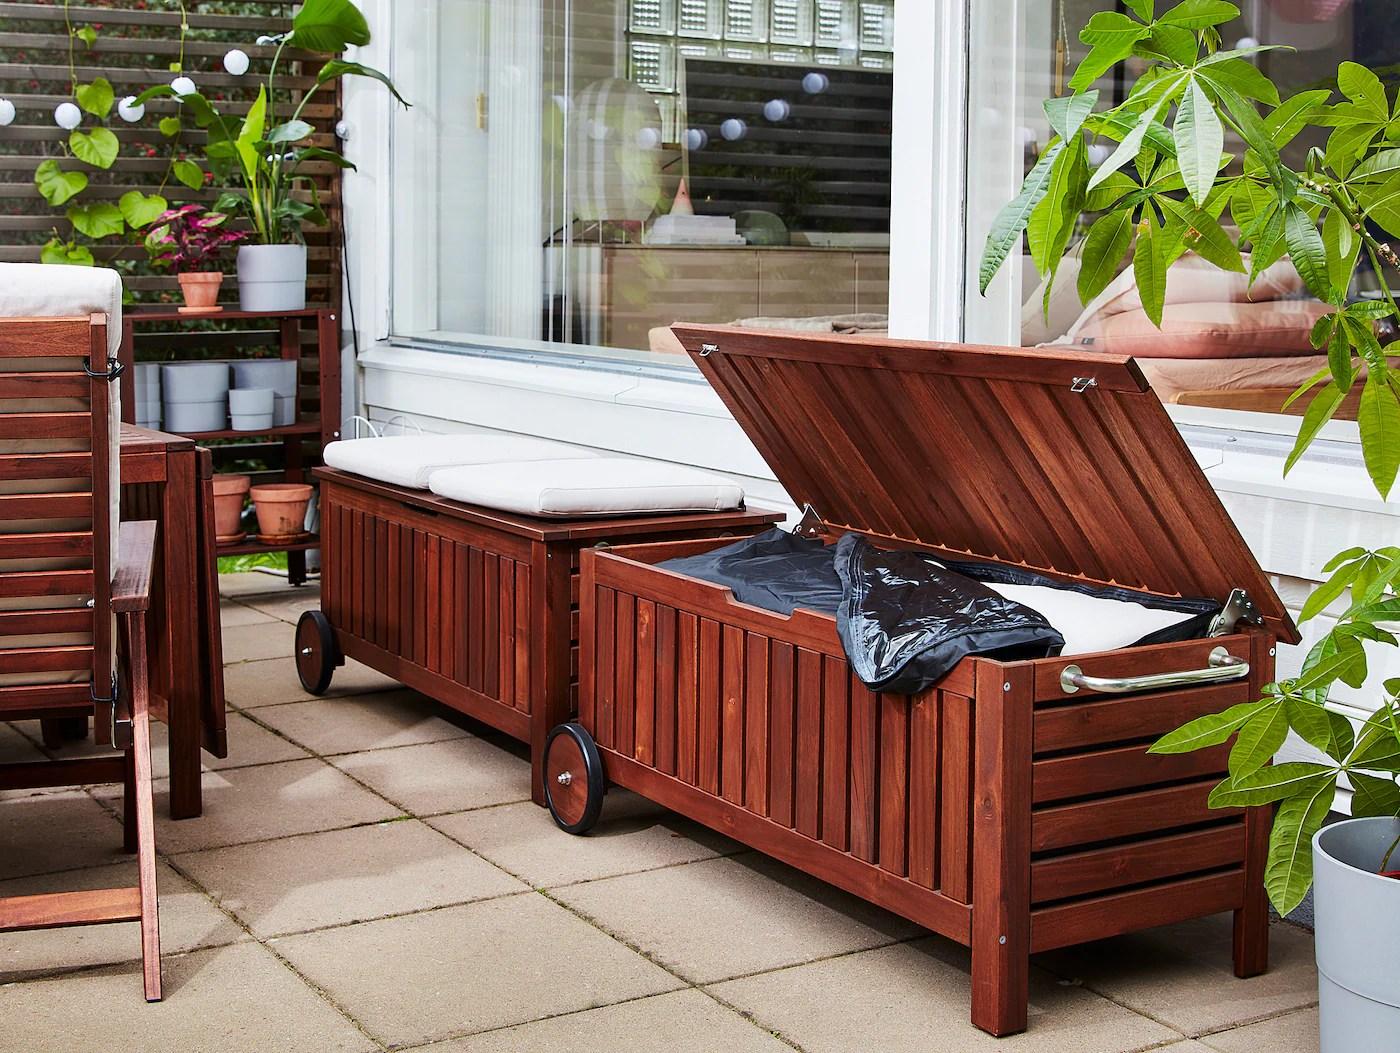 applaro storage bench outdoor brown stained 50 3 8x22 1 2